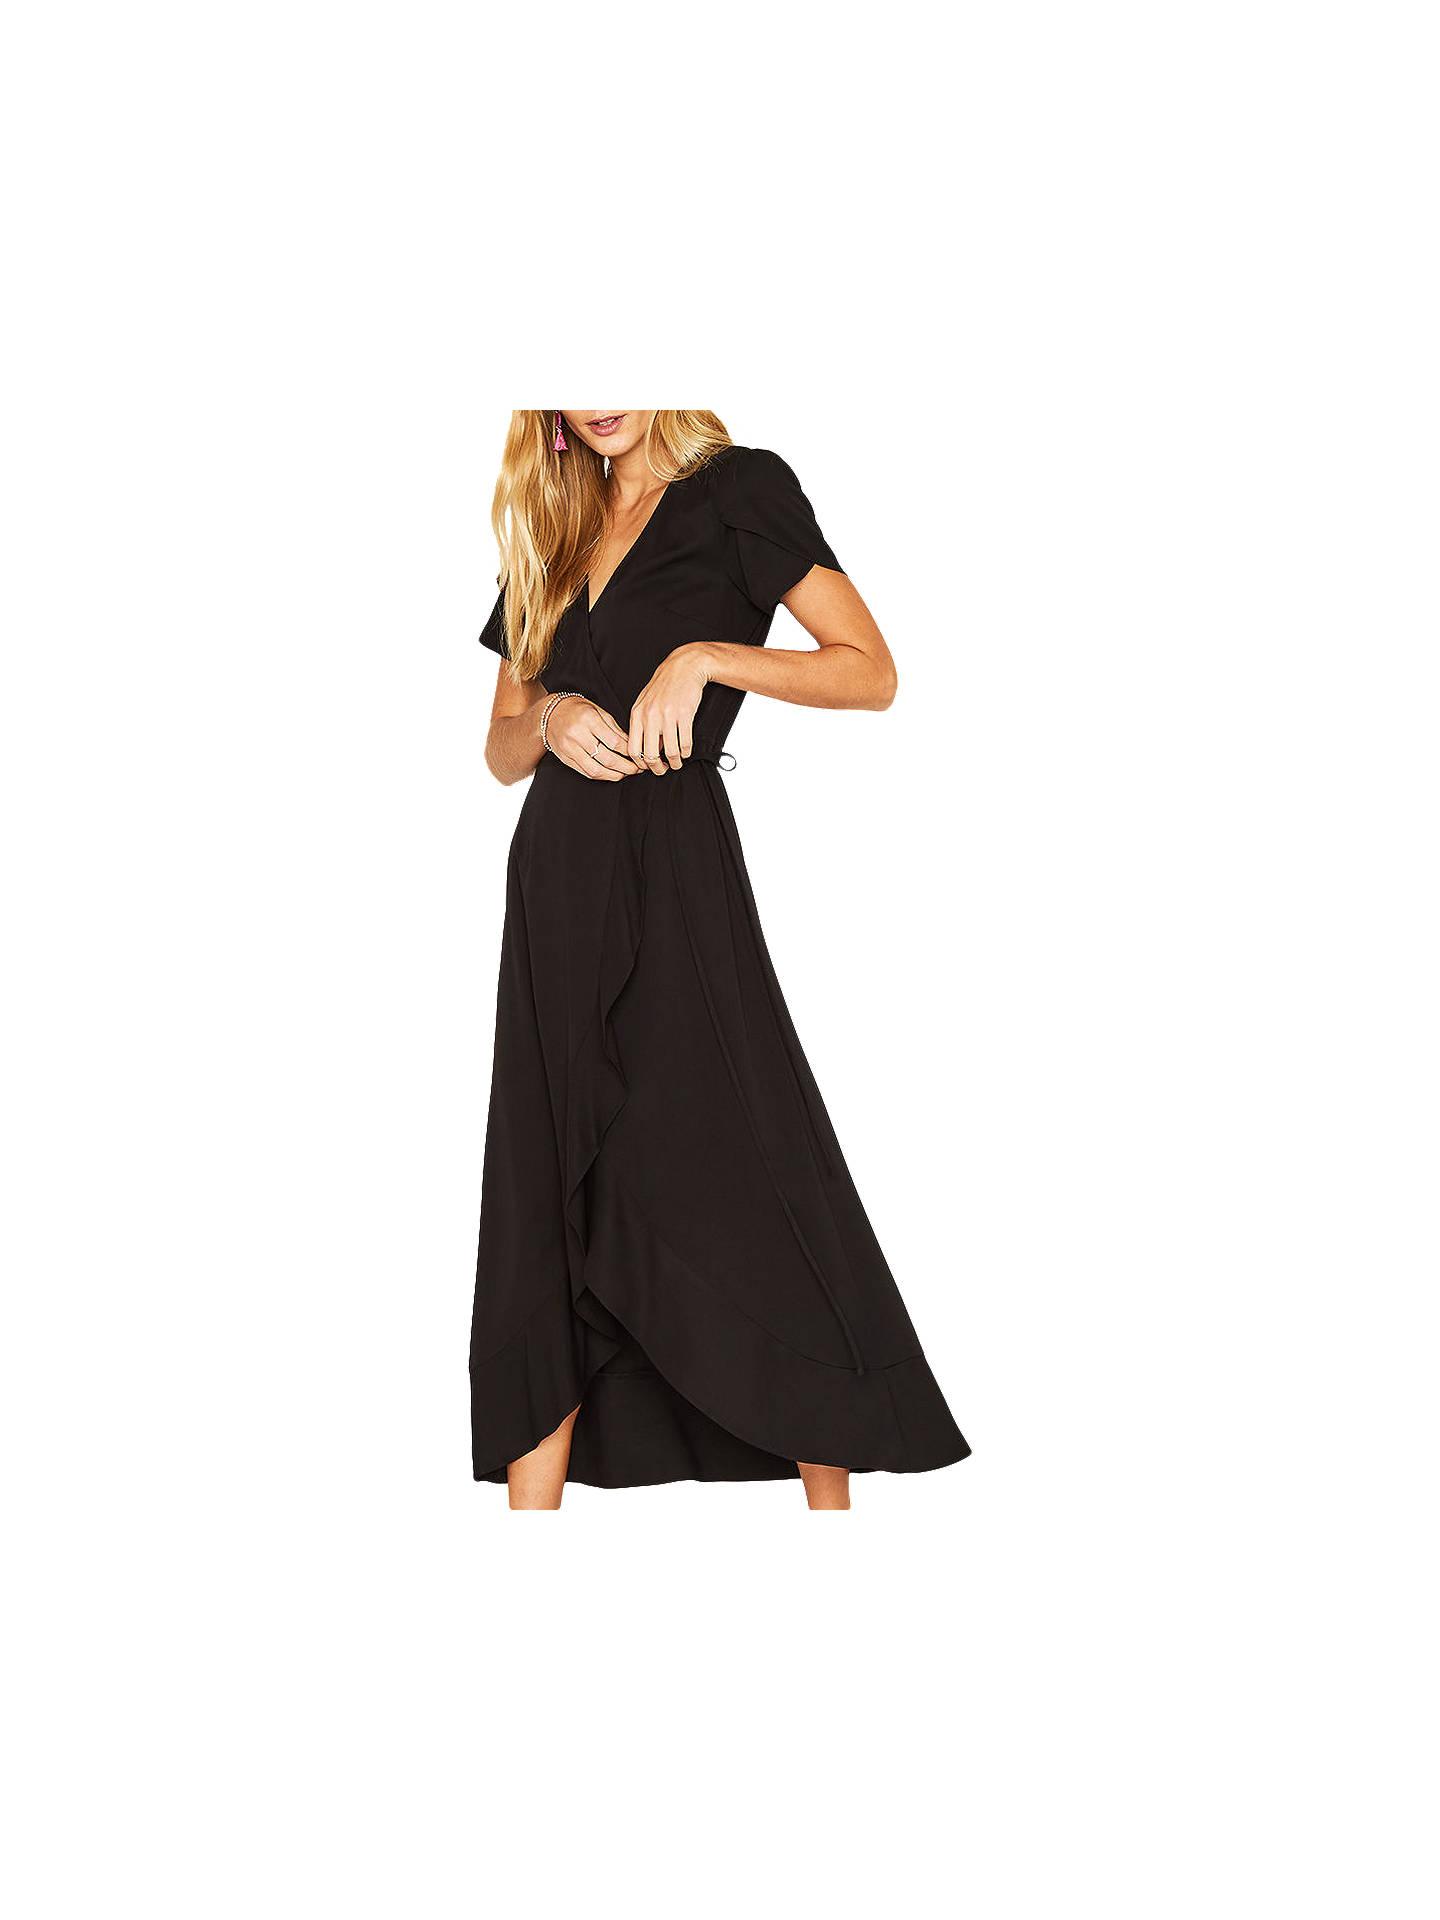 e2bd0a0e9791 Buy Oasis Wrap Midi Dress, Black, 6 Online at johnlewis.com ...